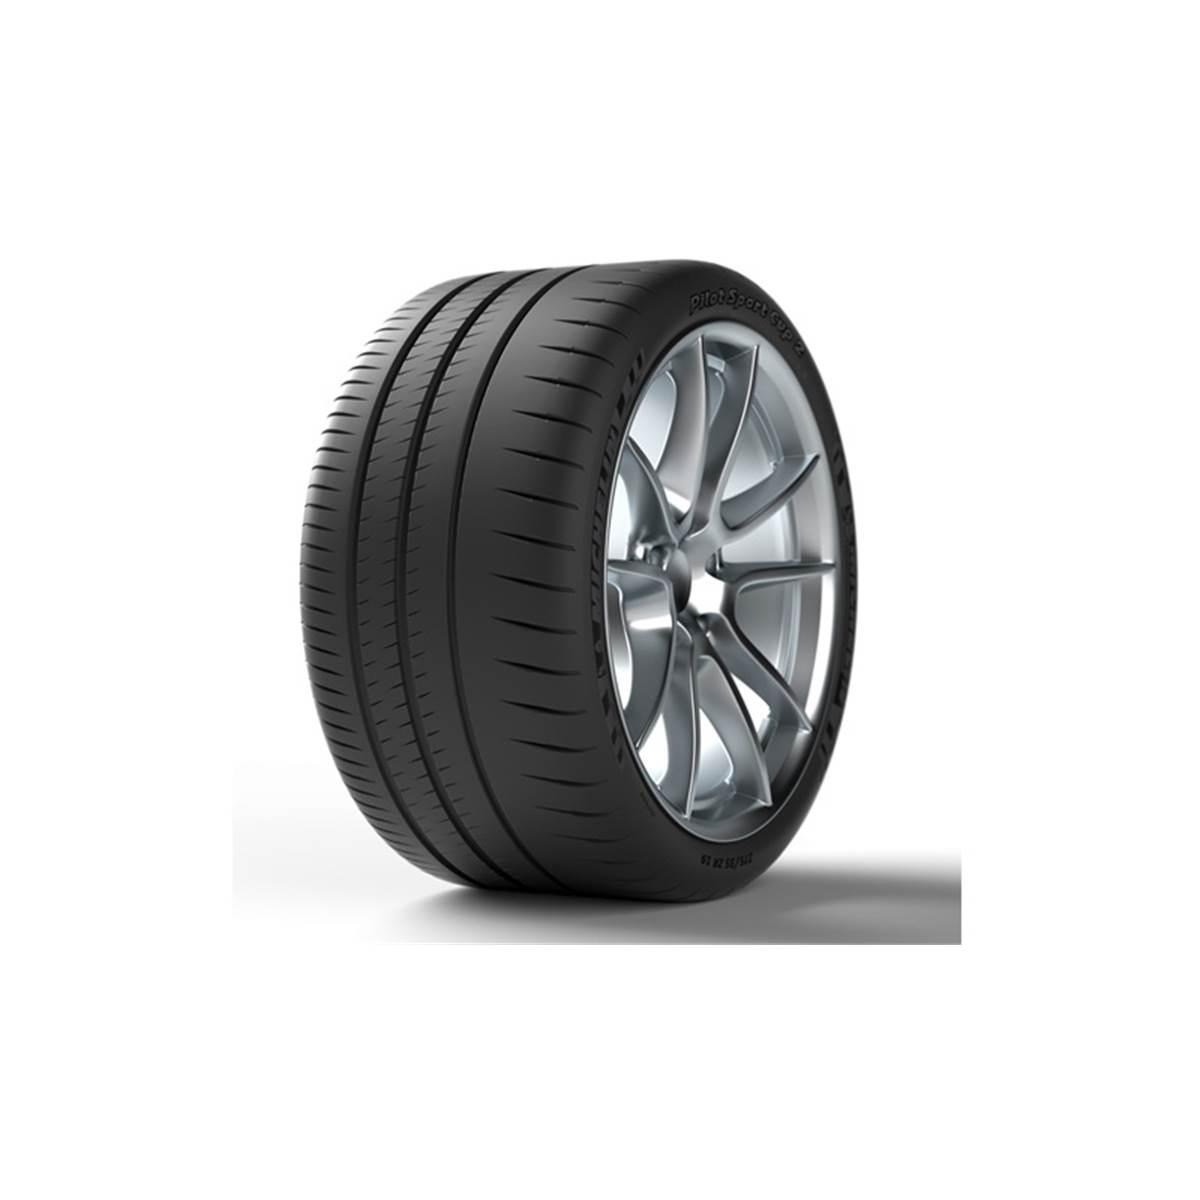 Pneu Michelin 245/40R18 97Y Pilot Sport Cup 2 XL